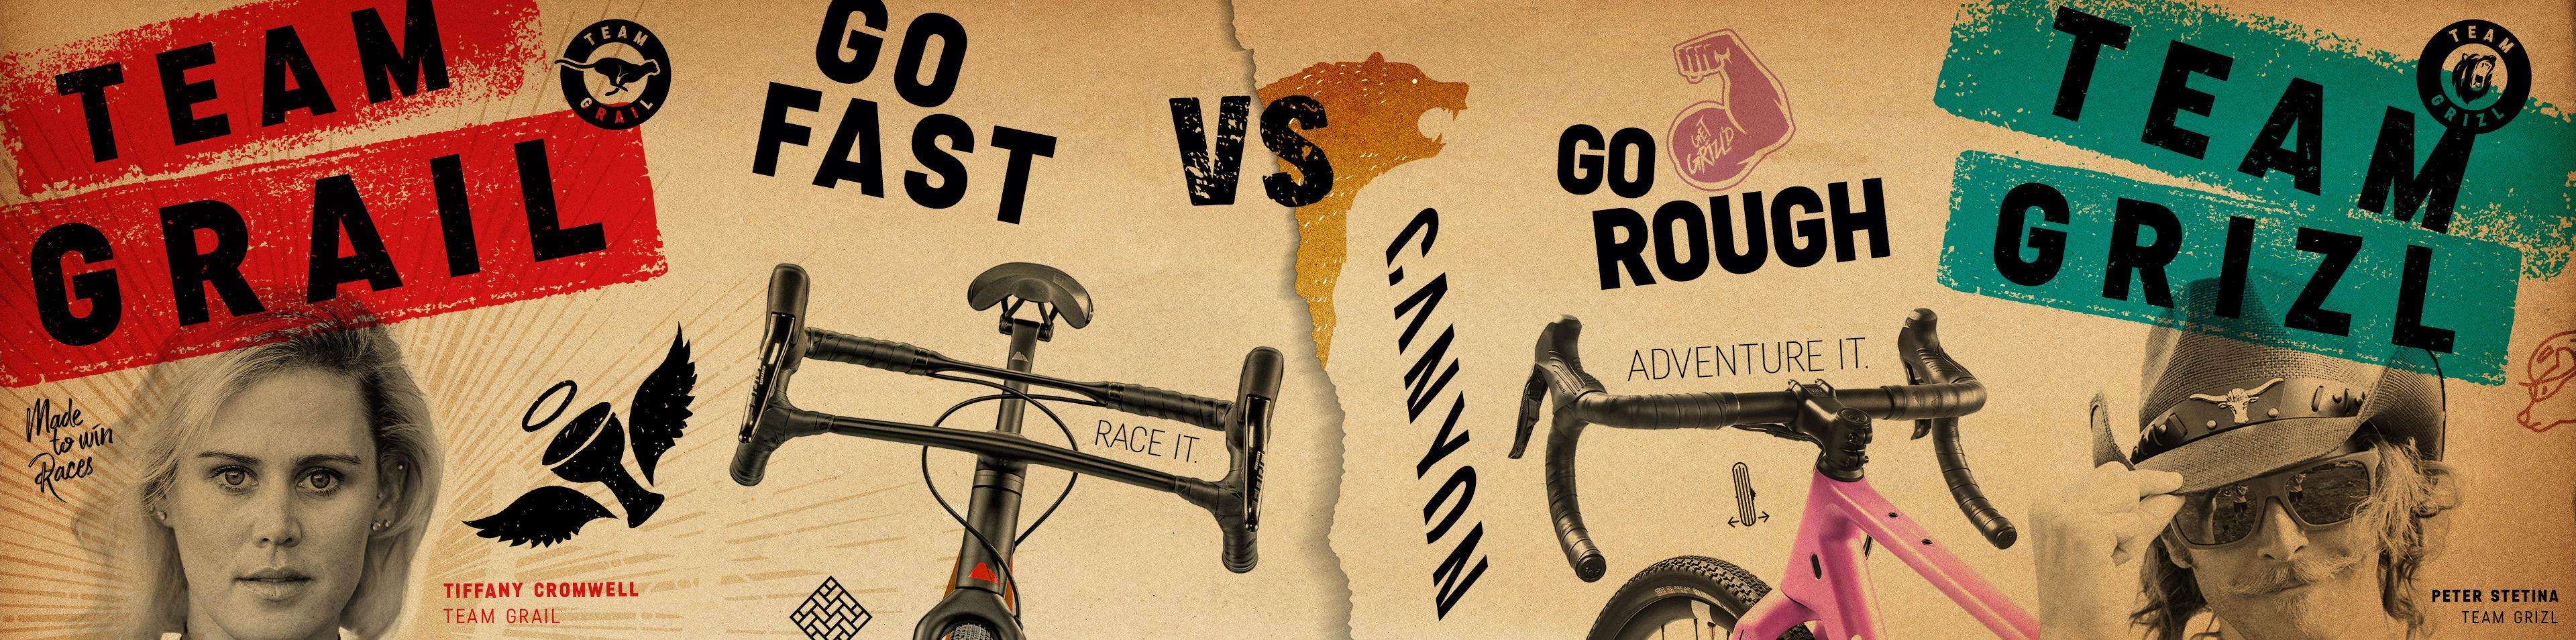 Win the Ultimate Adventure Bike Giveaway